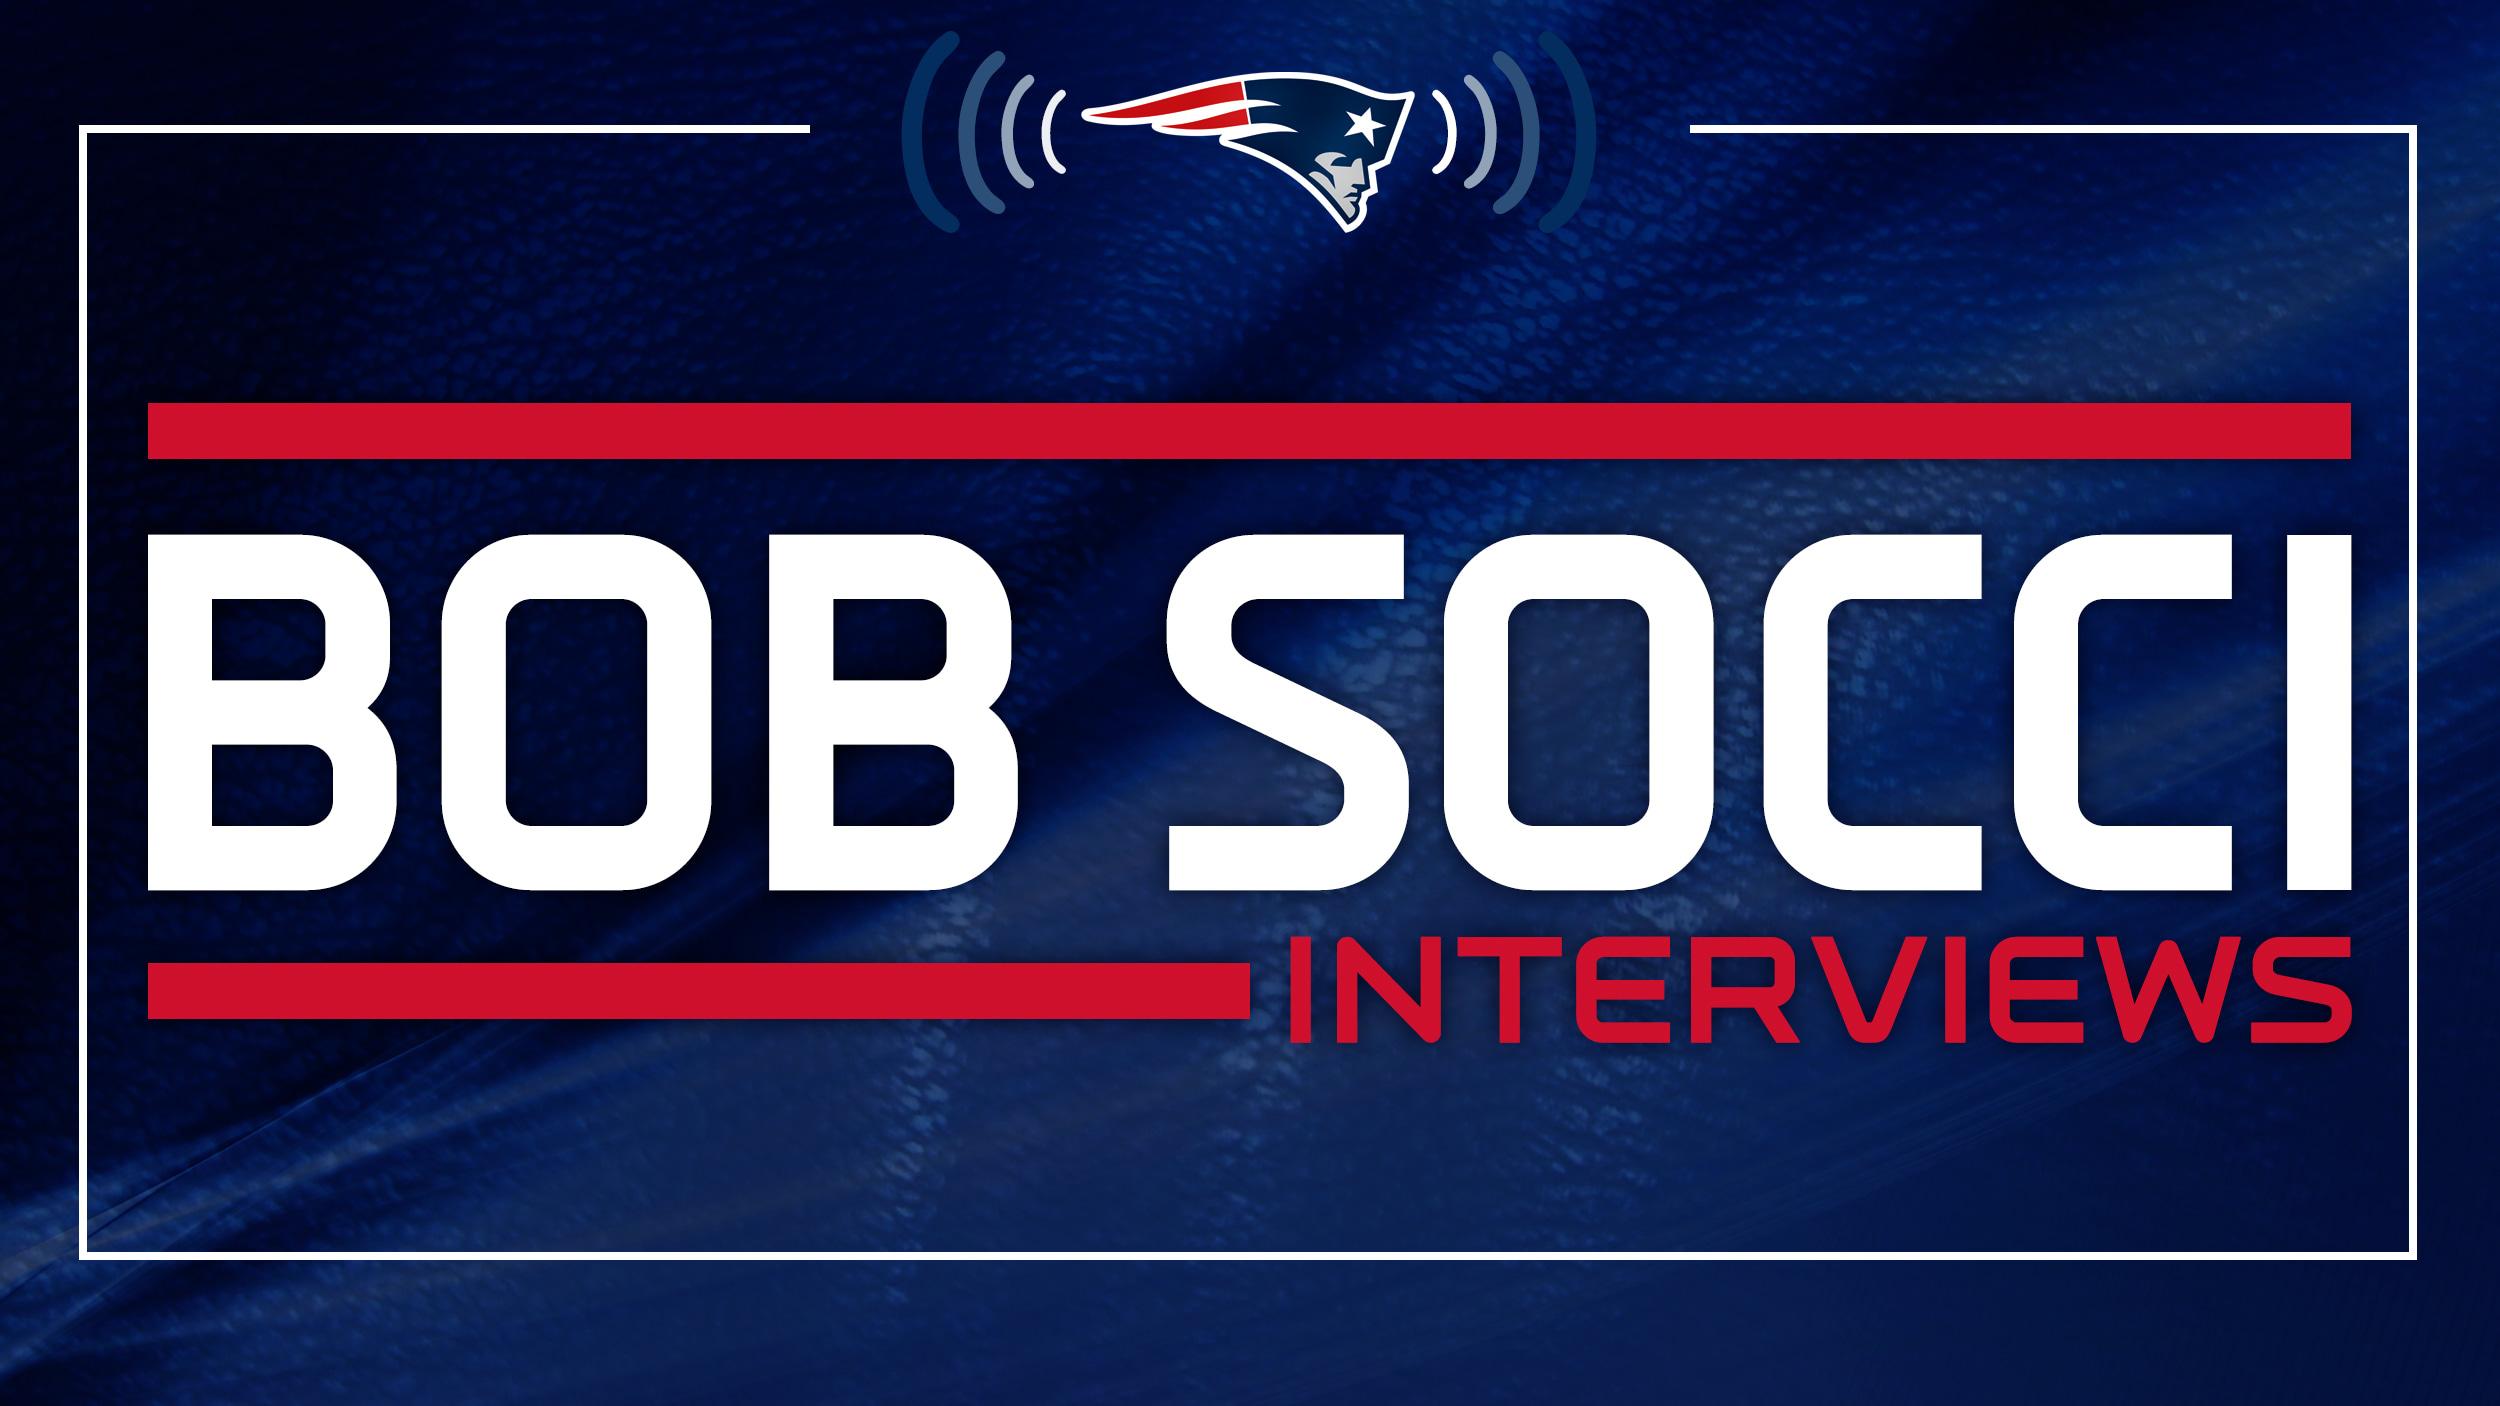 Bob Socci Interviews